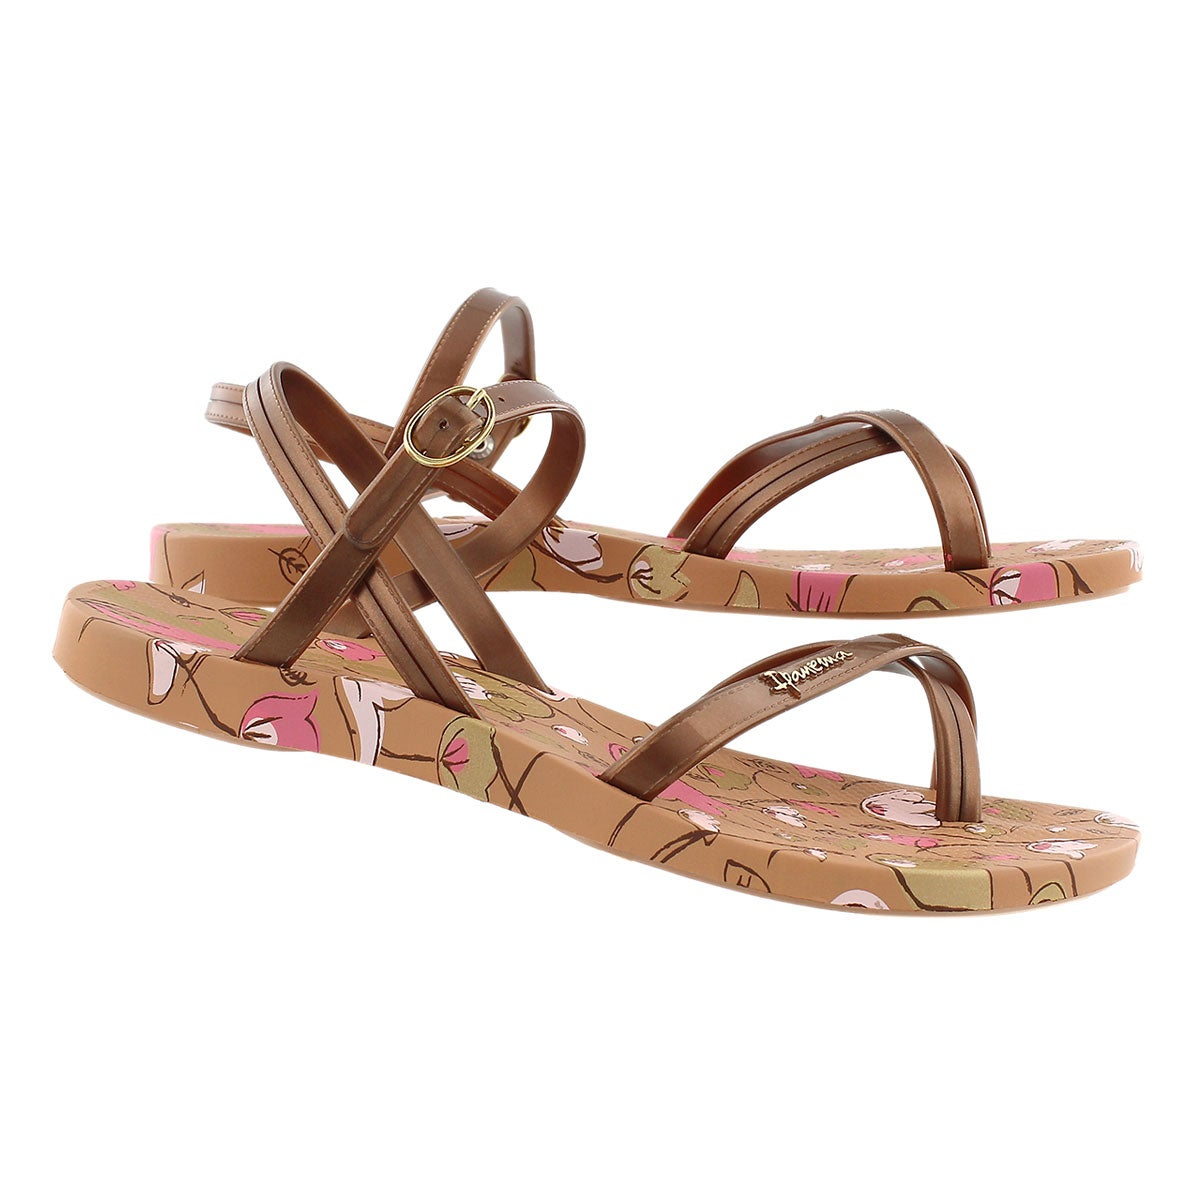 Sandale passe-orteil Sand, imp brun, fem